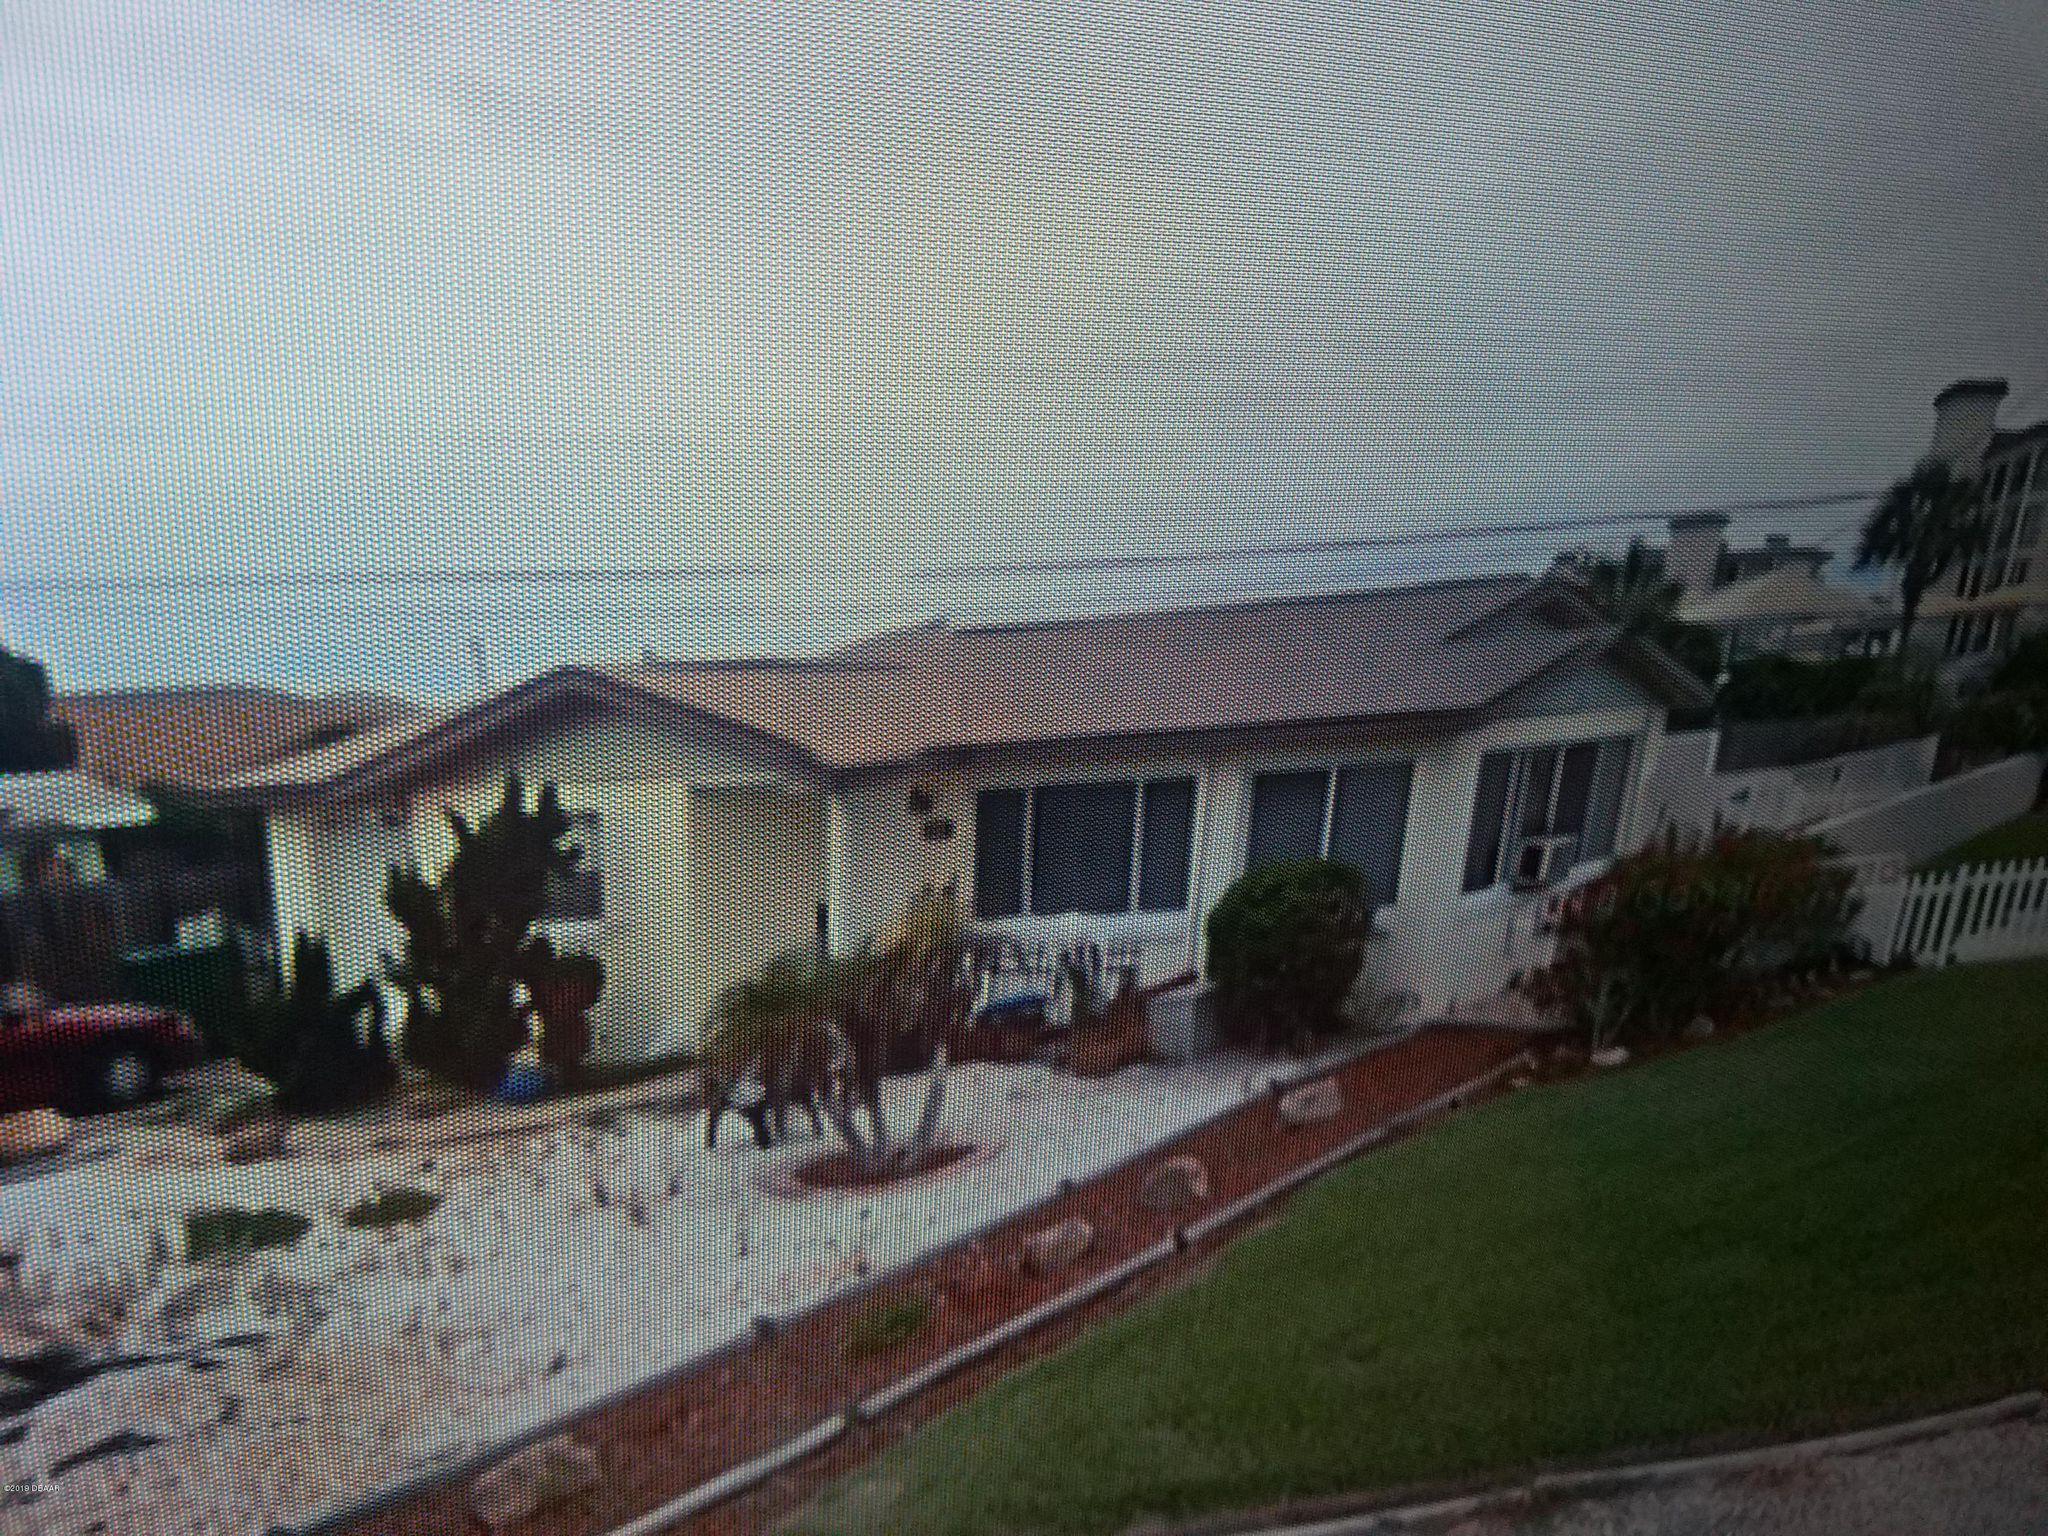 Wondrous 5 San Jose Cir Ormond Beach Fl 32176 2 Bed 1 Bath Single Family Home Mls 1052553 Trulia Download Free Architecture Designs Pushbritishbridgeorg